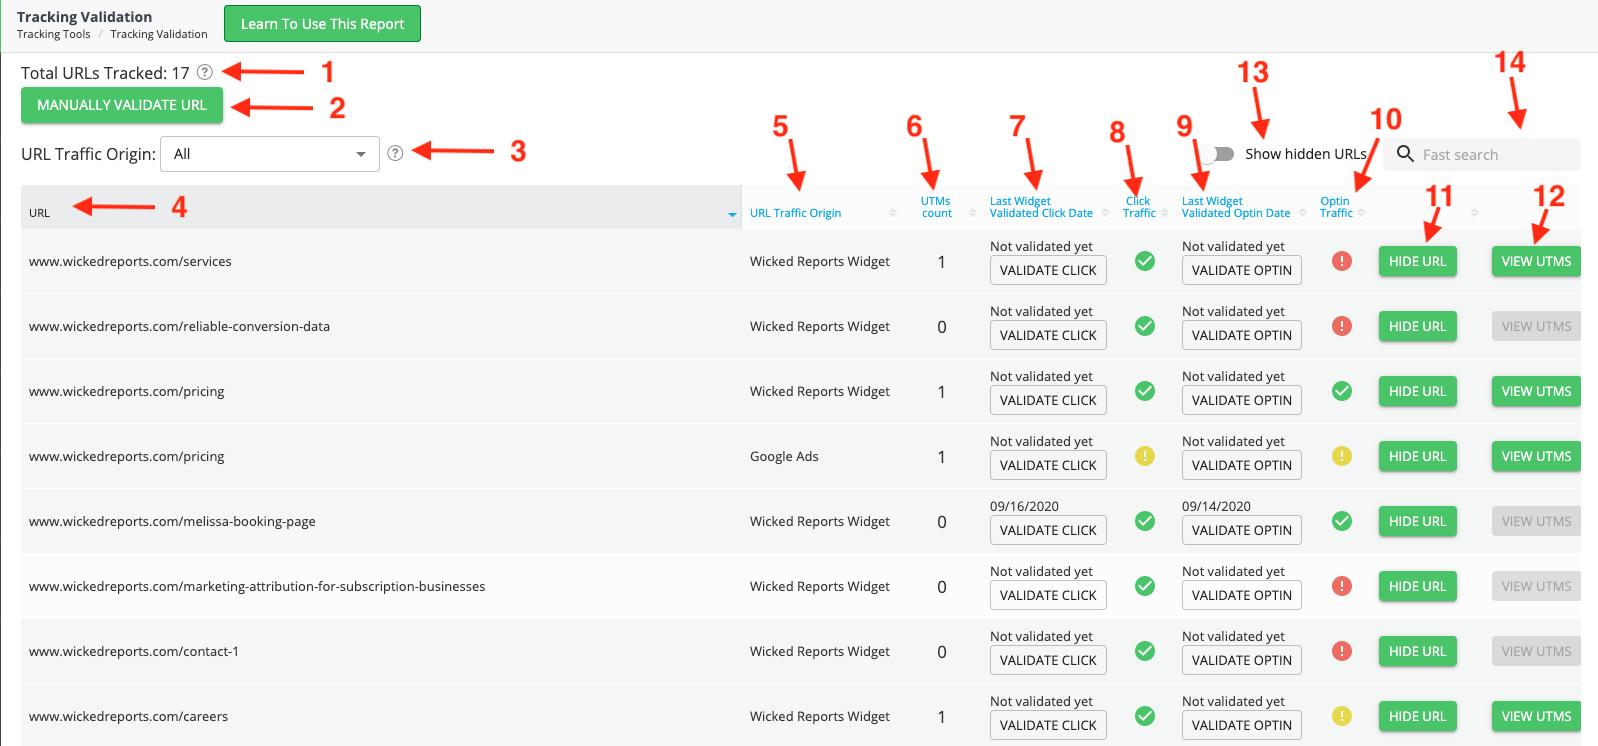 Tracking Validation tool